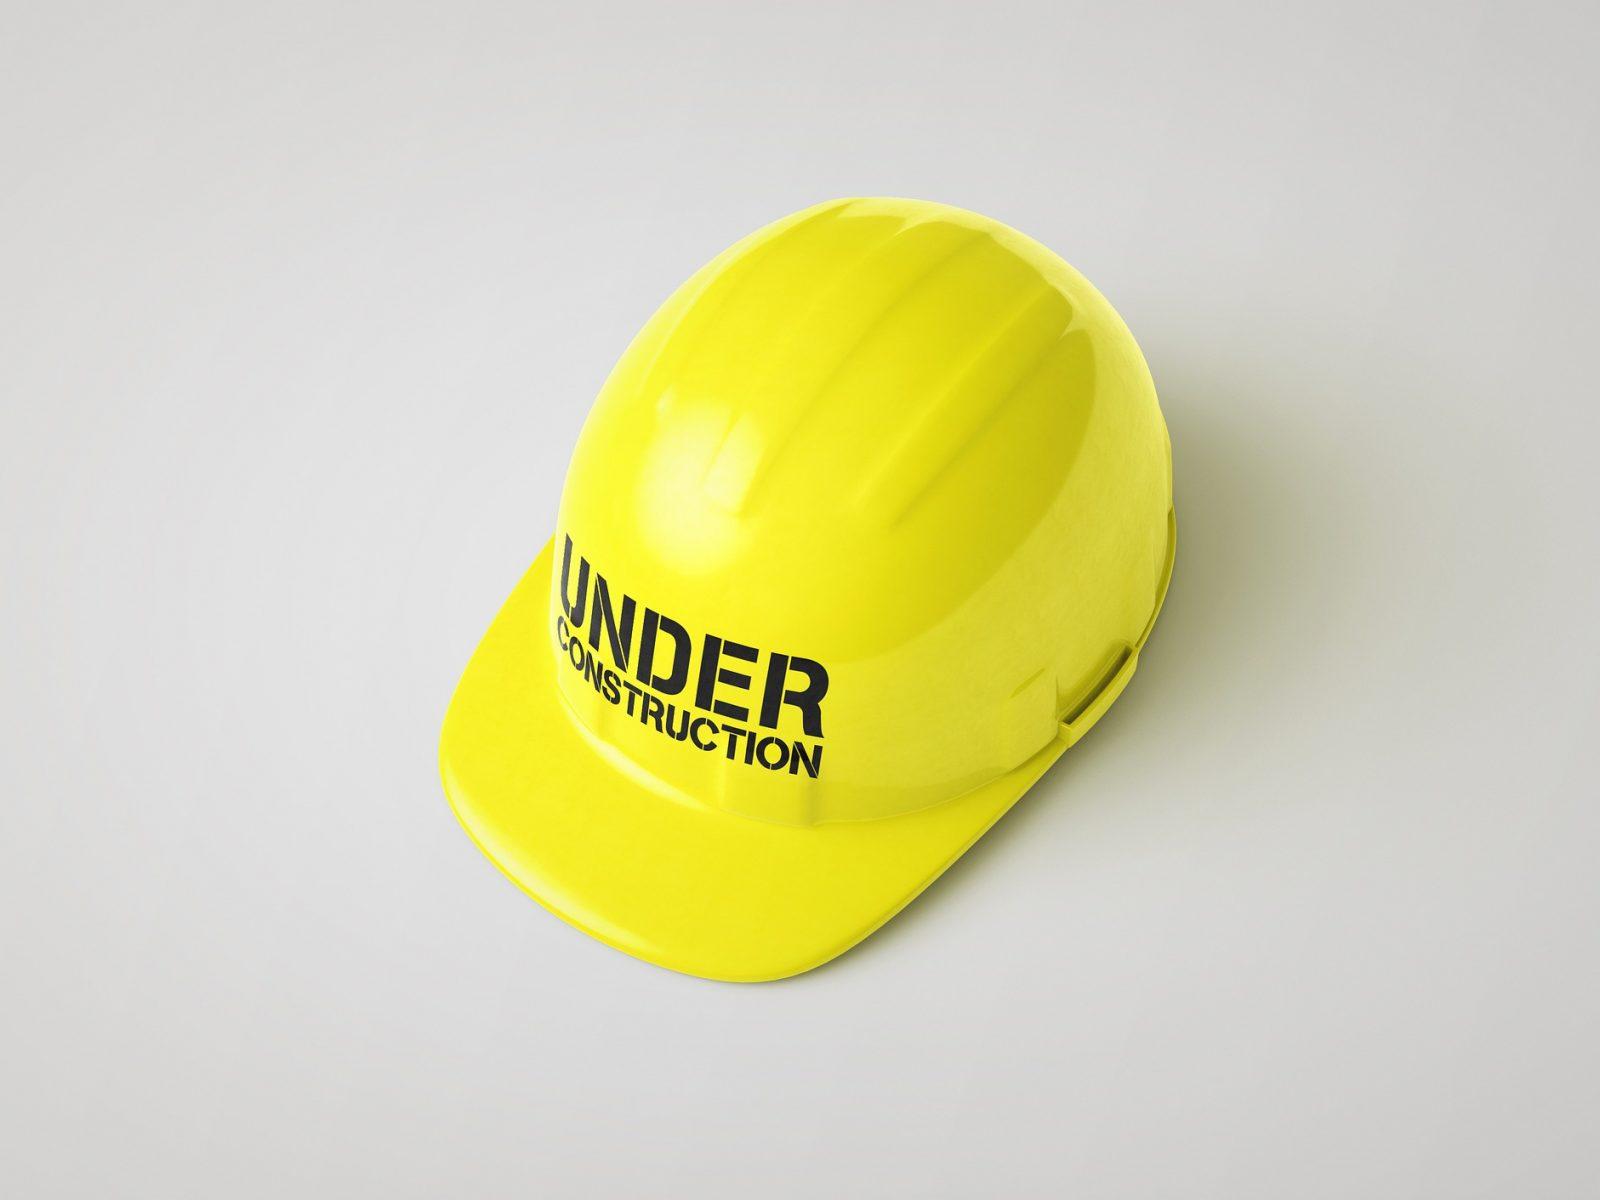 construction-3075498_1920